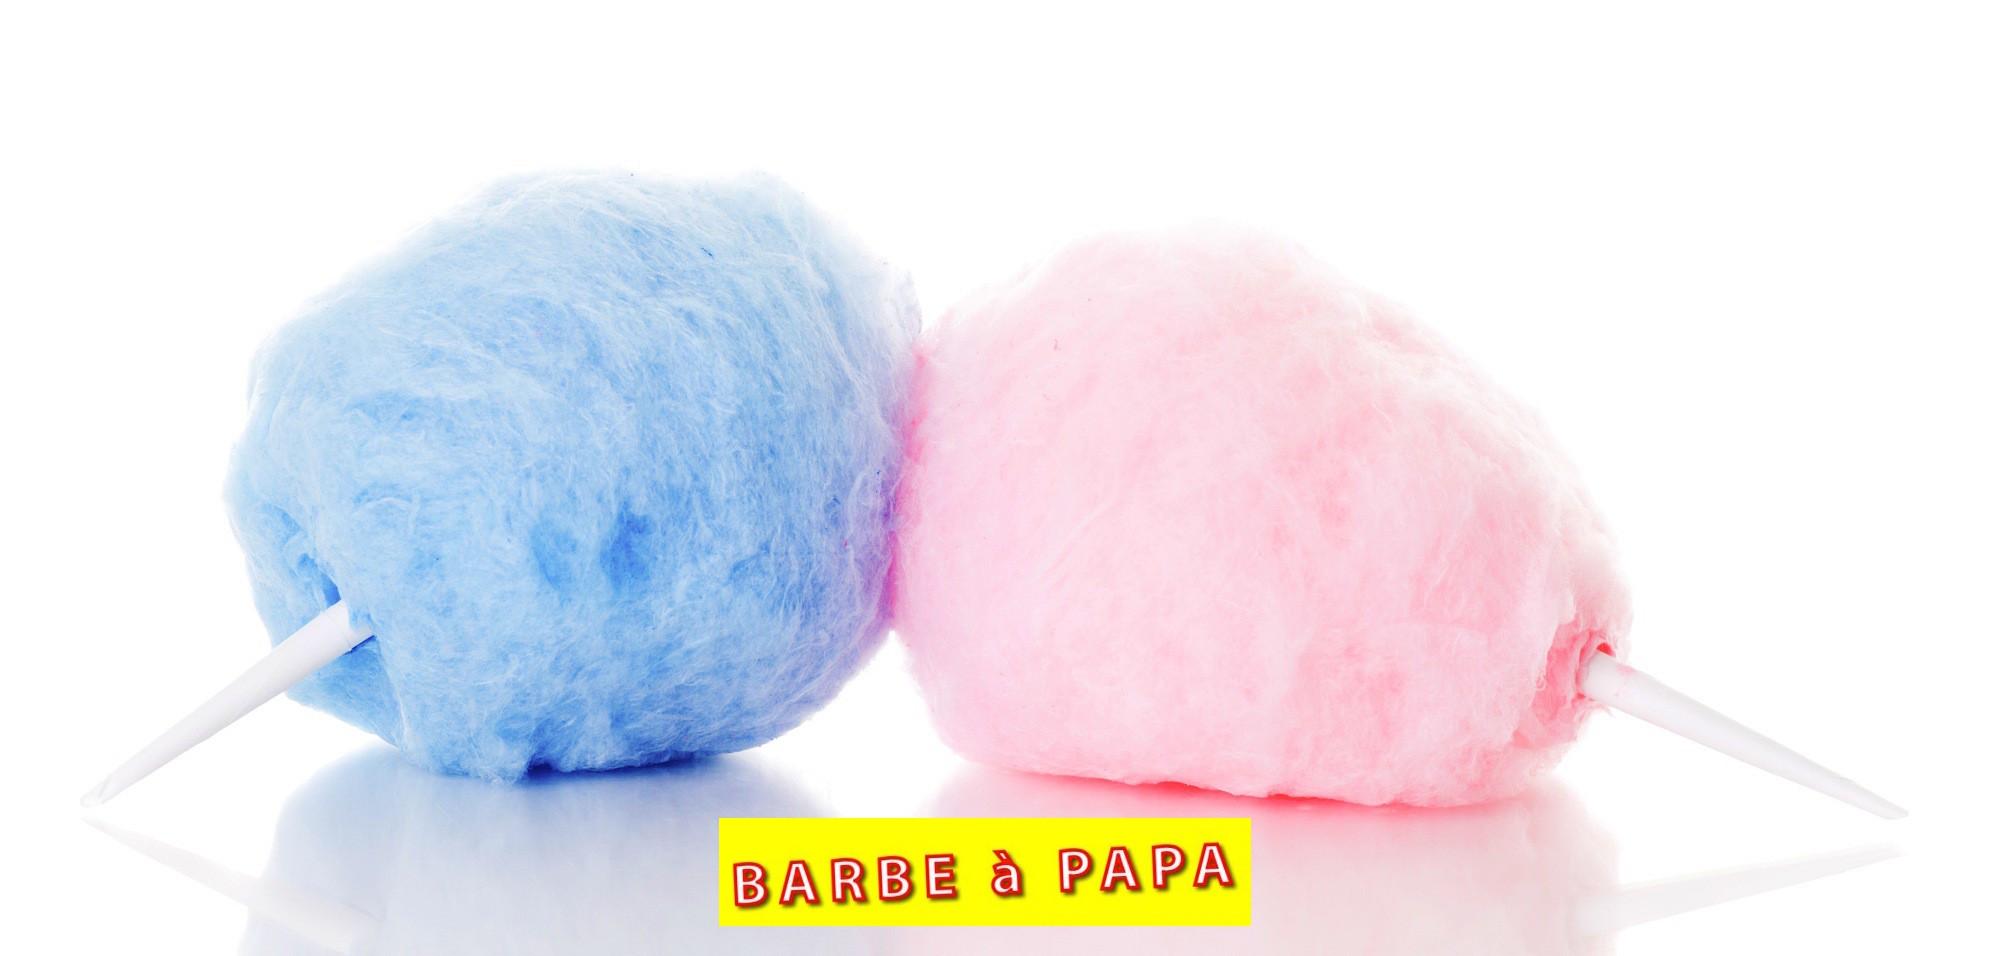 barbe-a-papa-solubarome.jpg